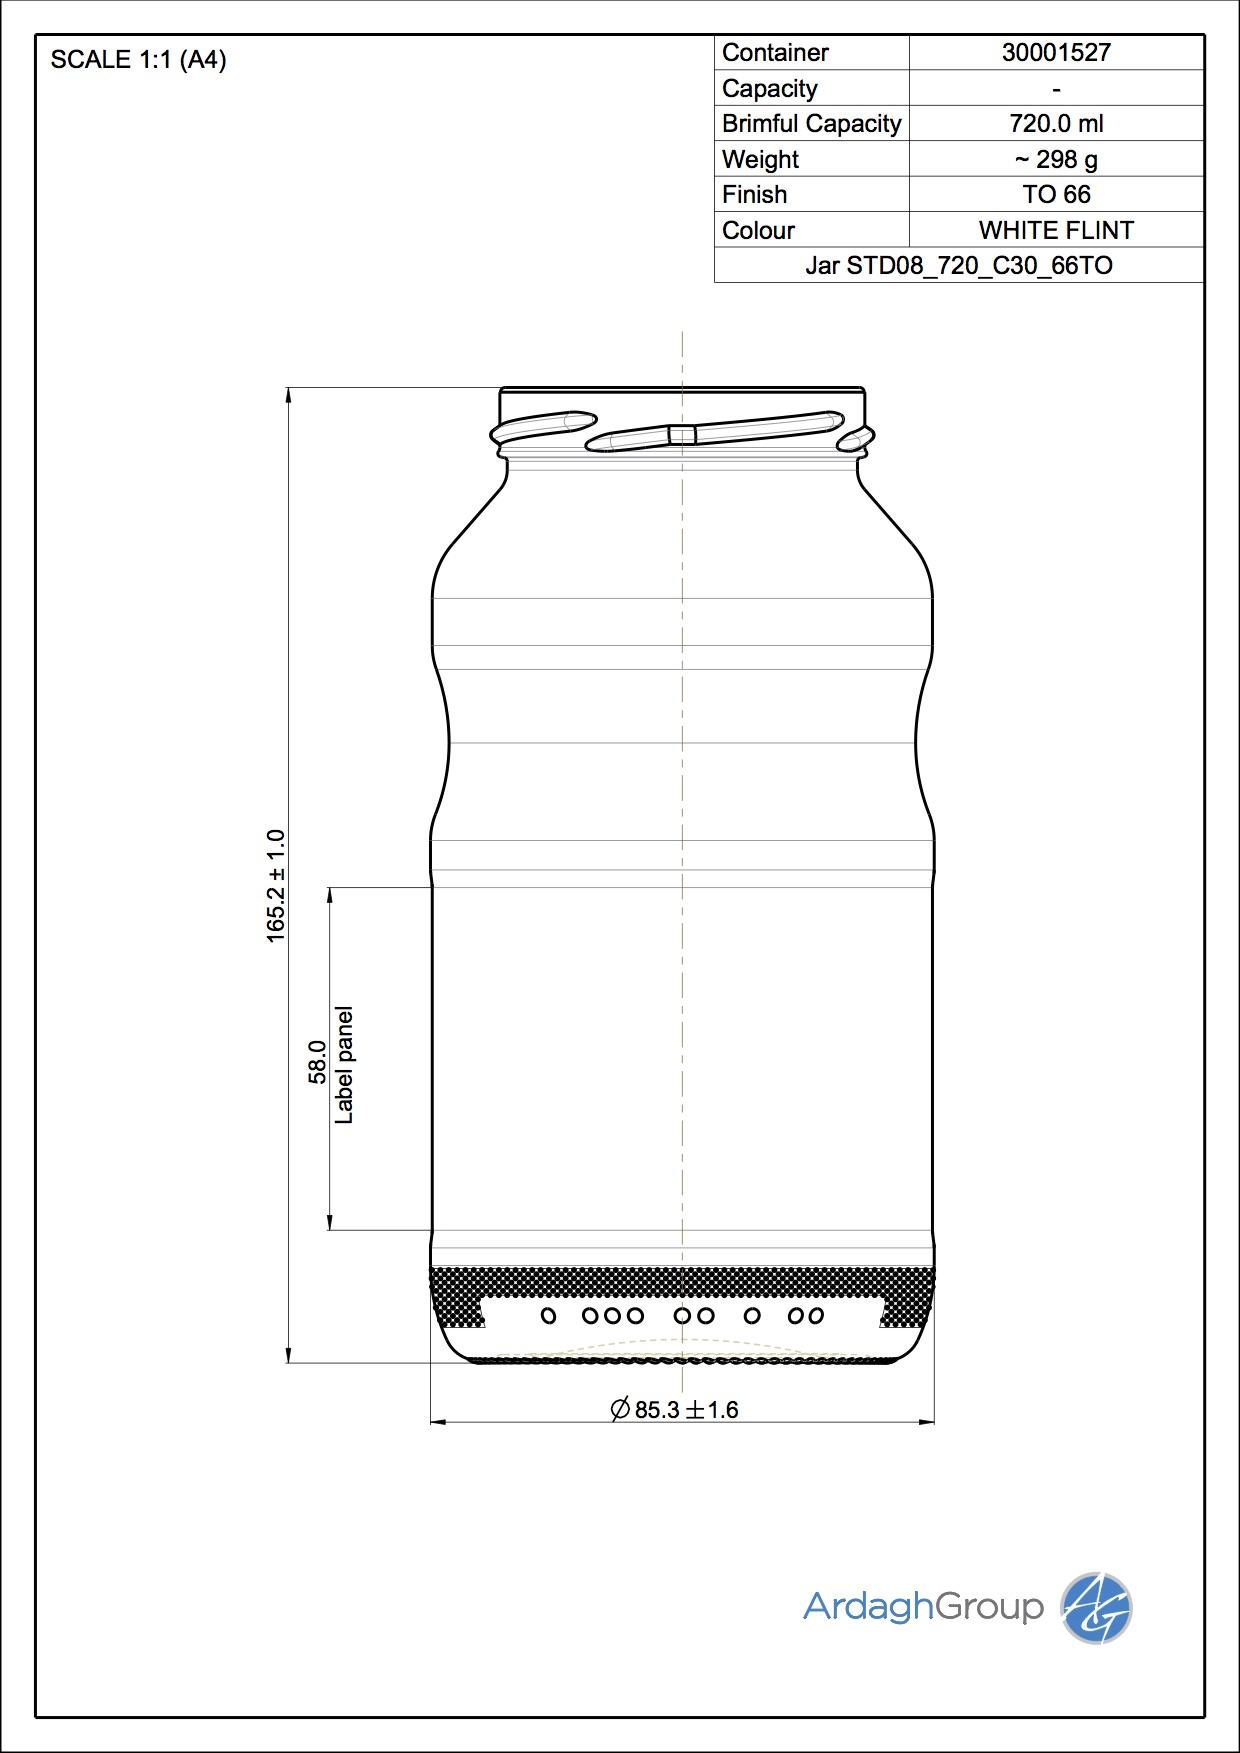 Jar STD08 720 C30 66TO